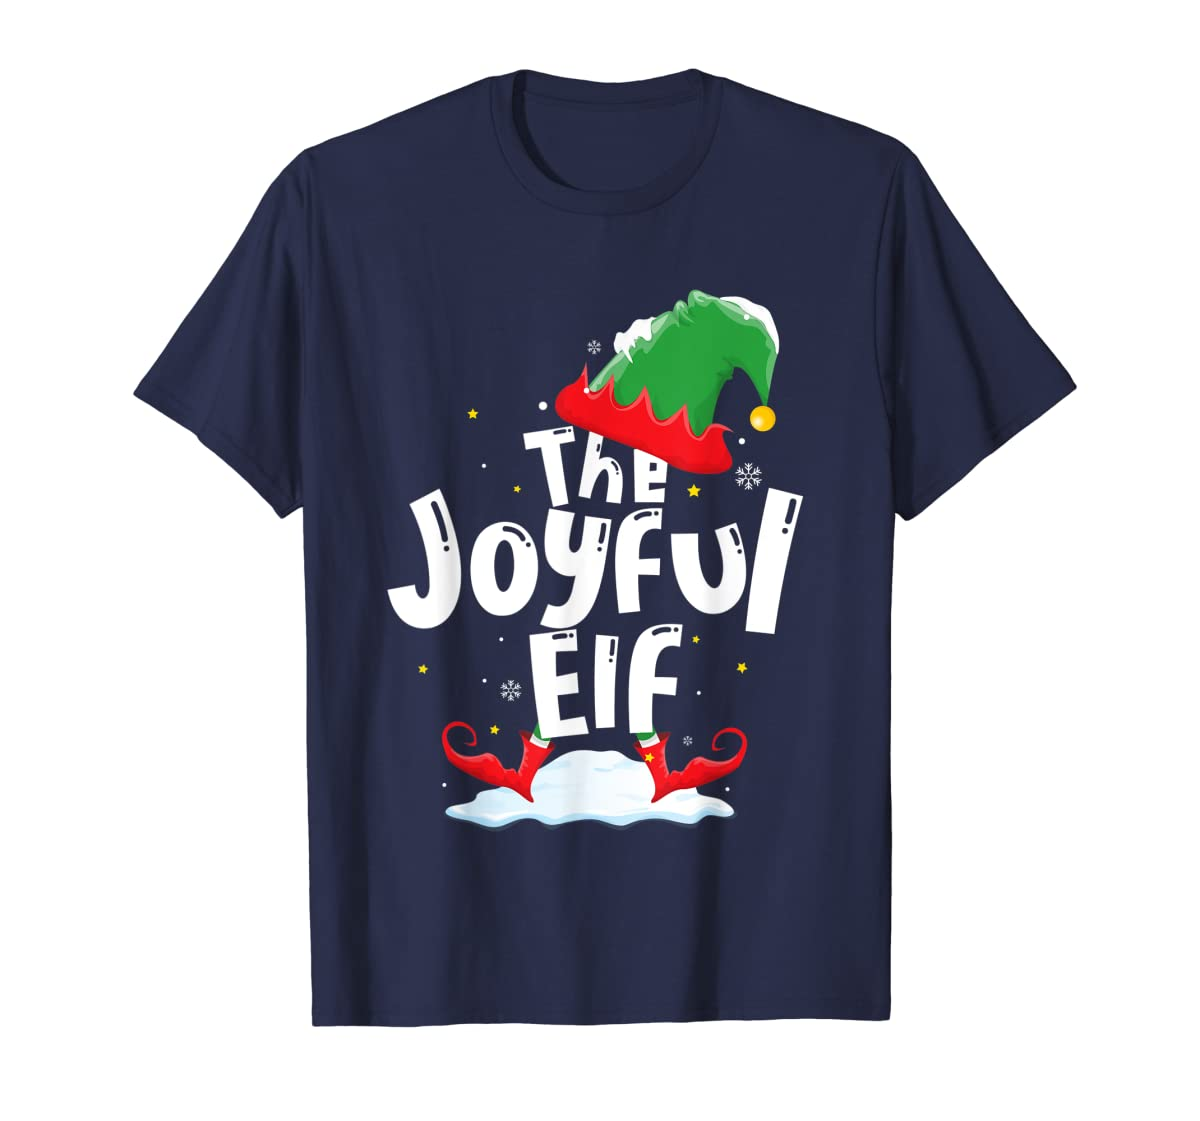 The Joyful Elf Group Matching Family Christmas Gifts Holiday T-Shirt-Men's T-Shirt-Navy